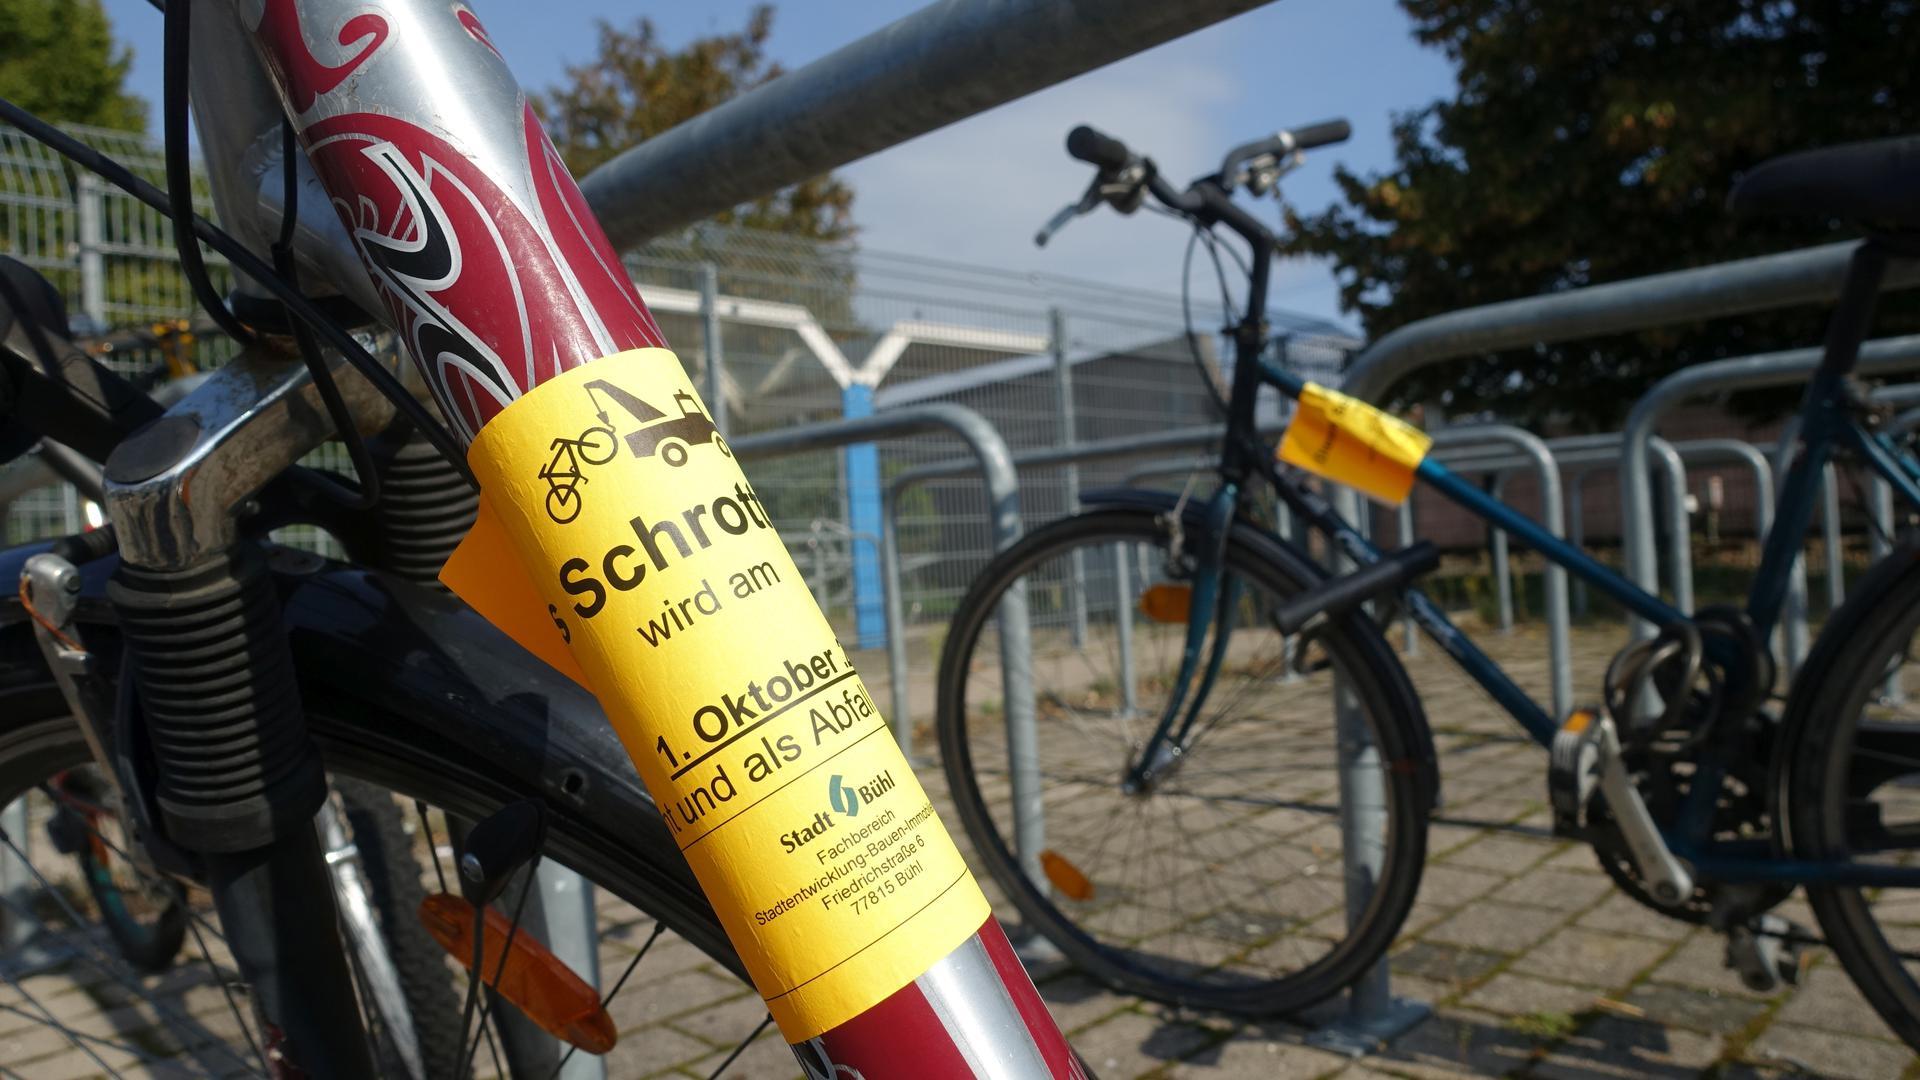 Fahrrad mit Aufkleber